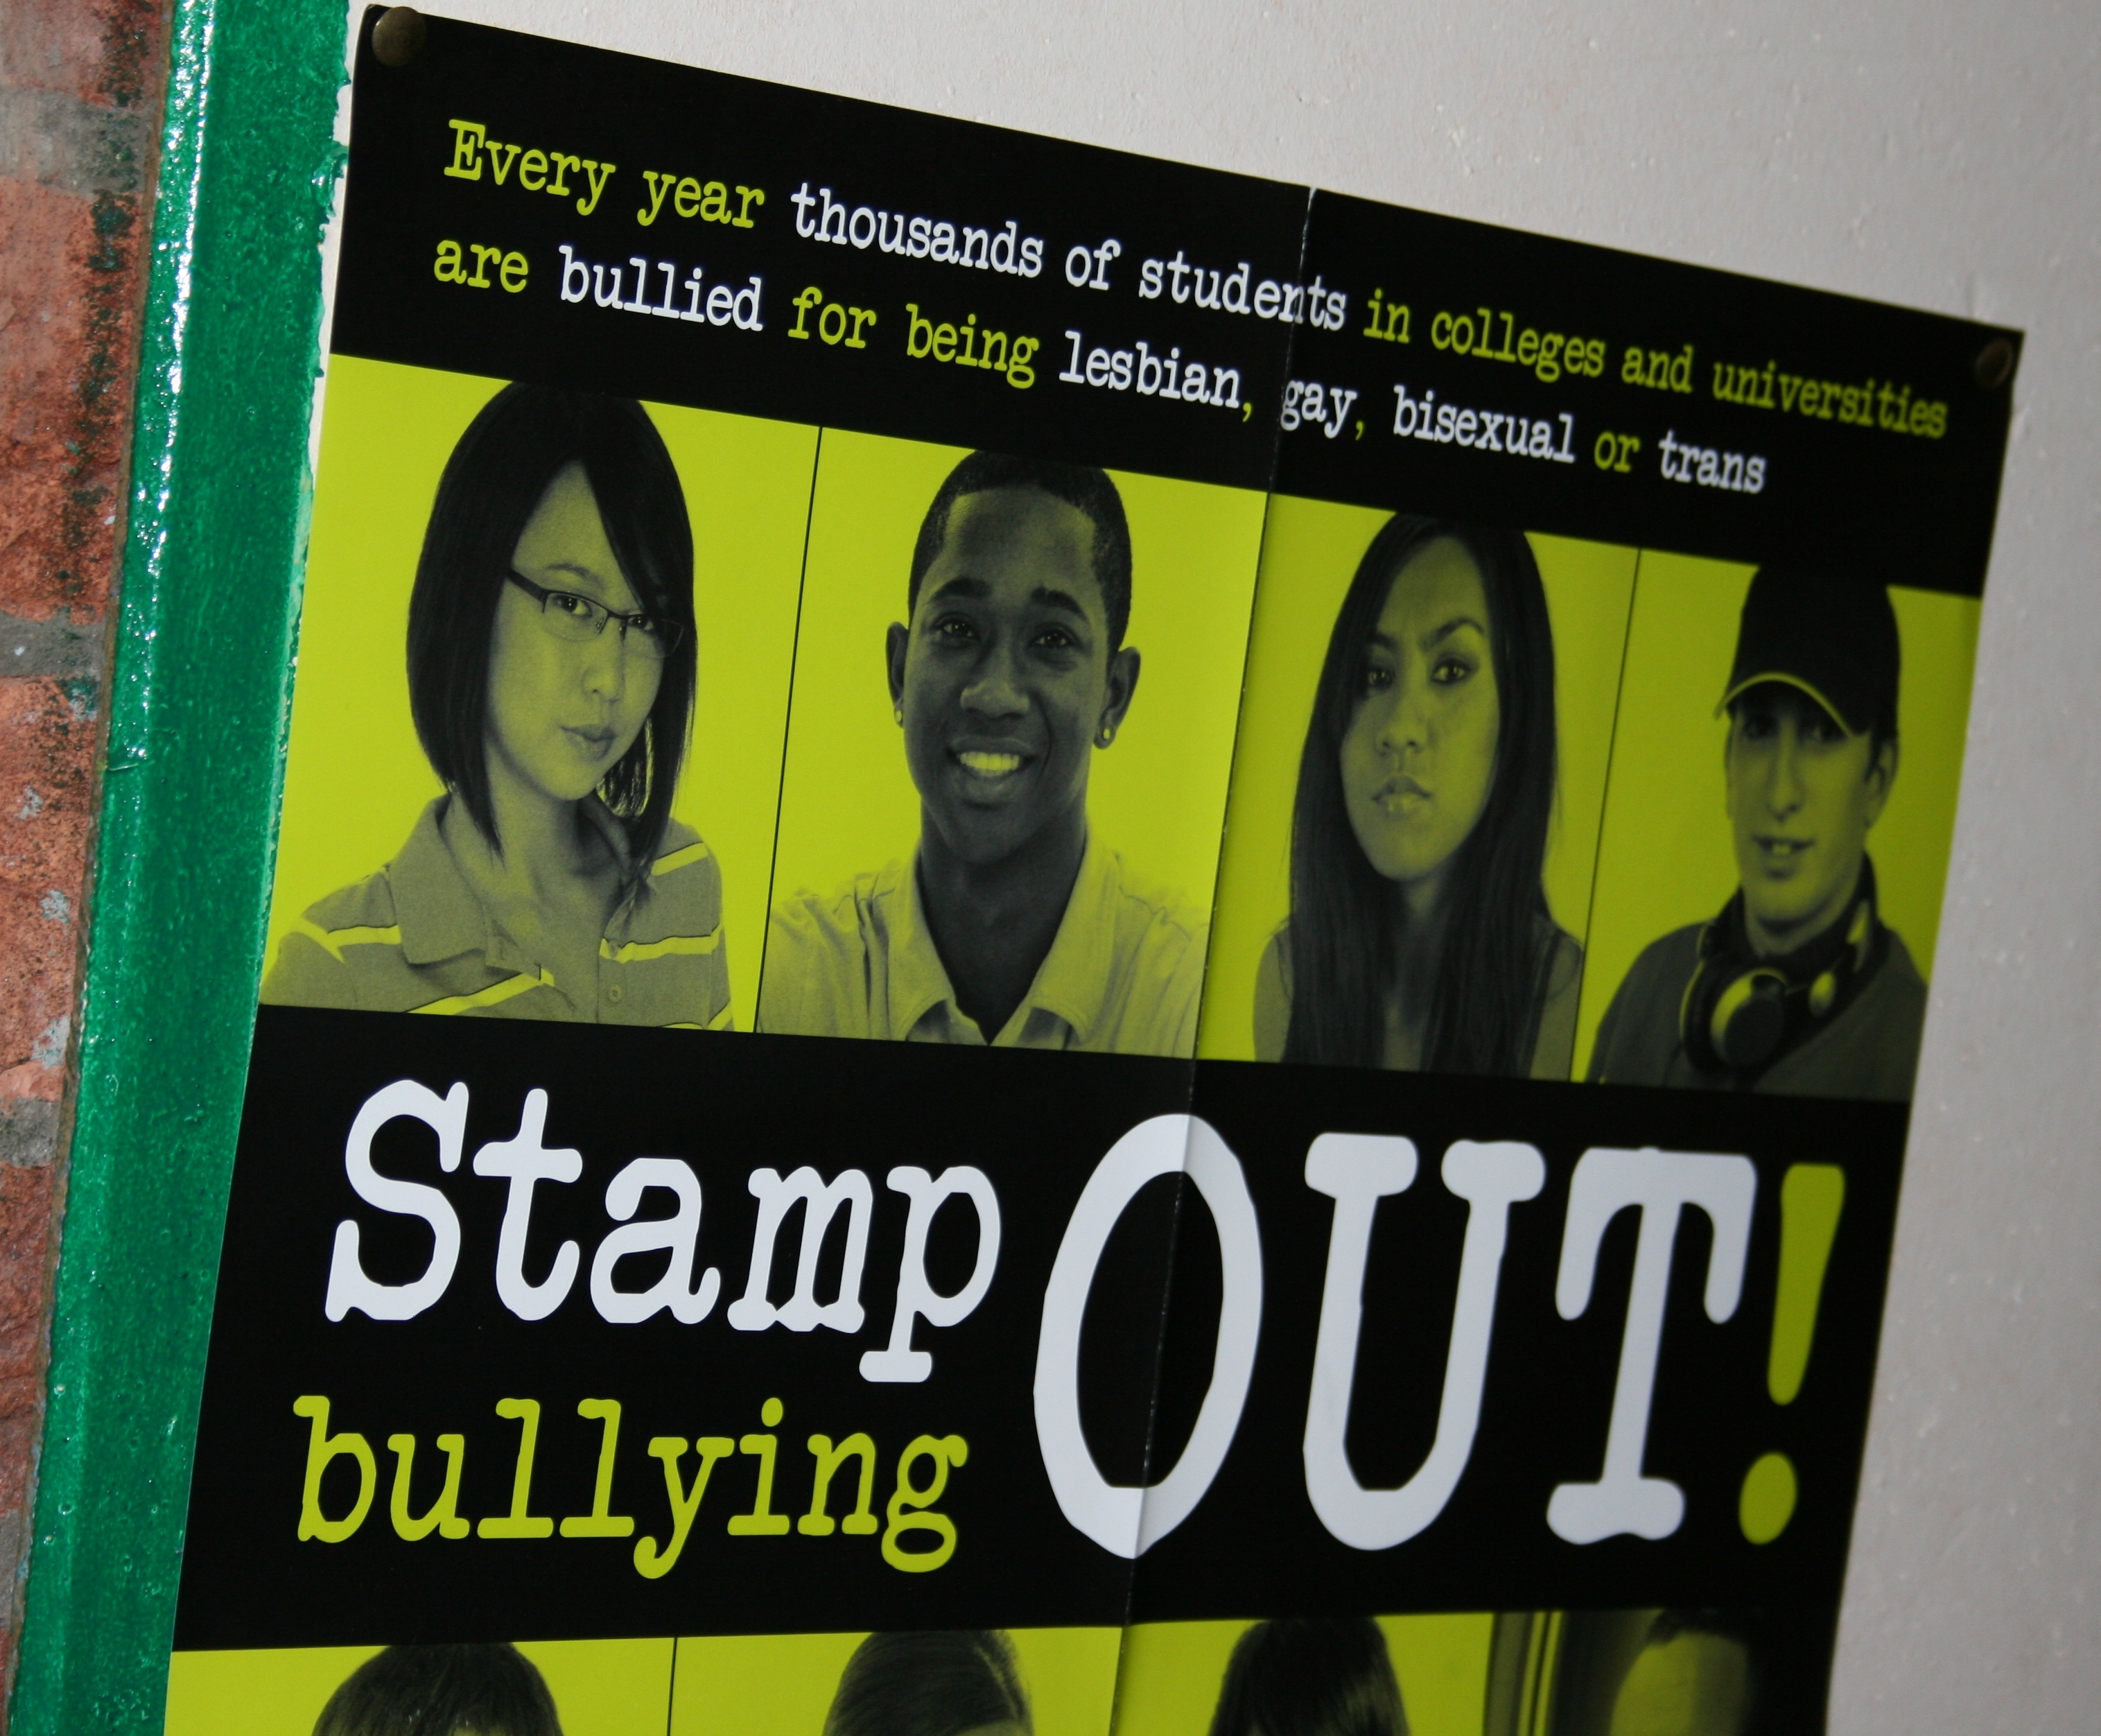 David Morris-Anti LGBT bullying